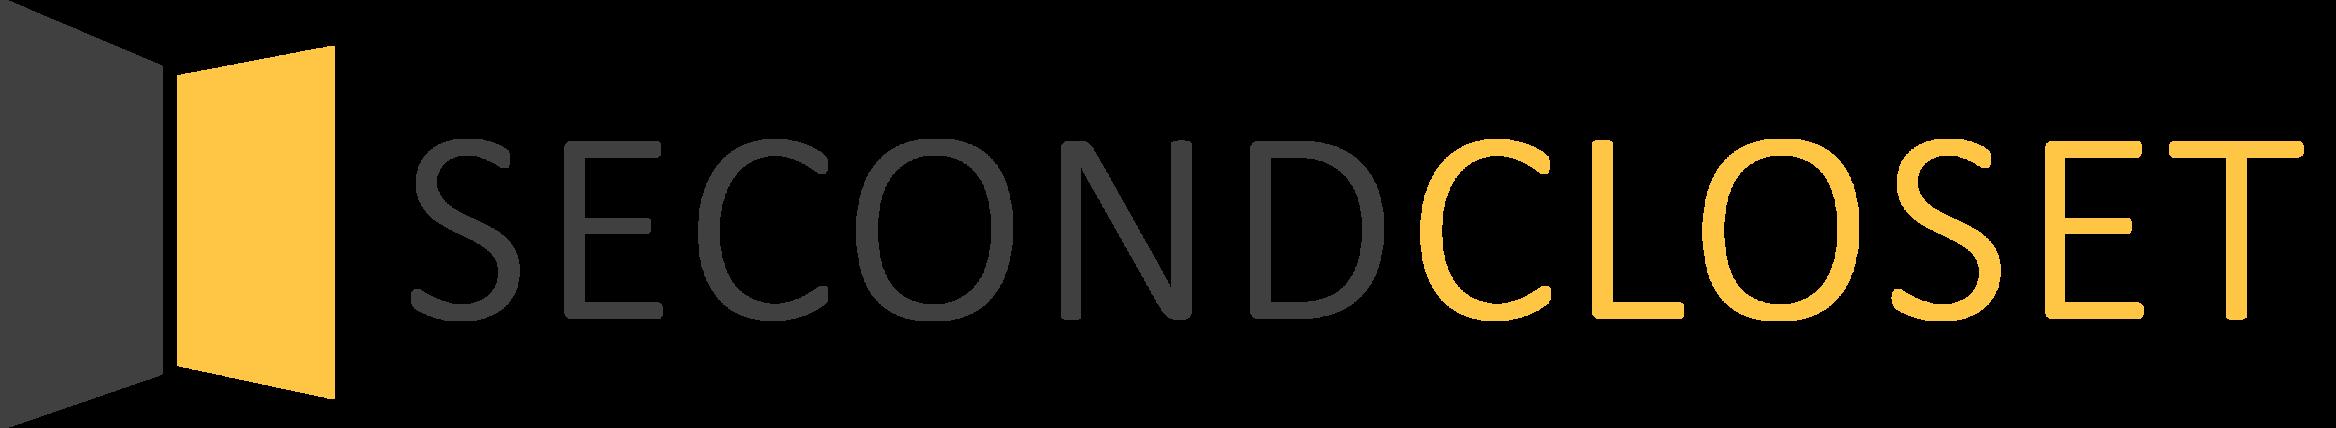 SecondCloset logo